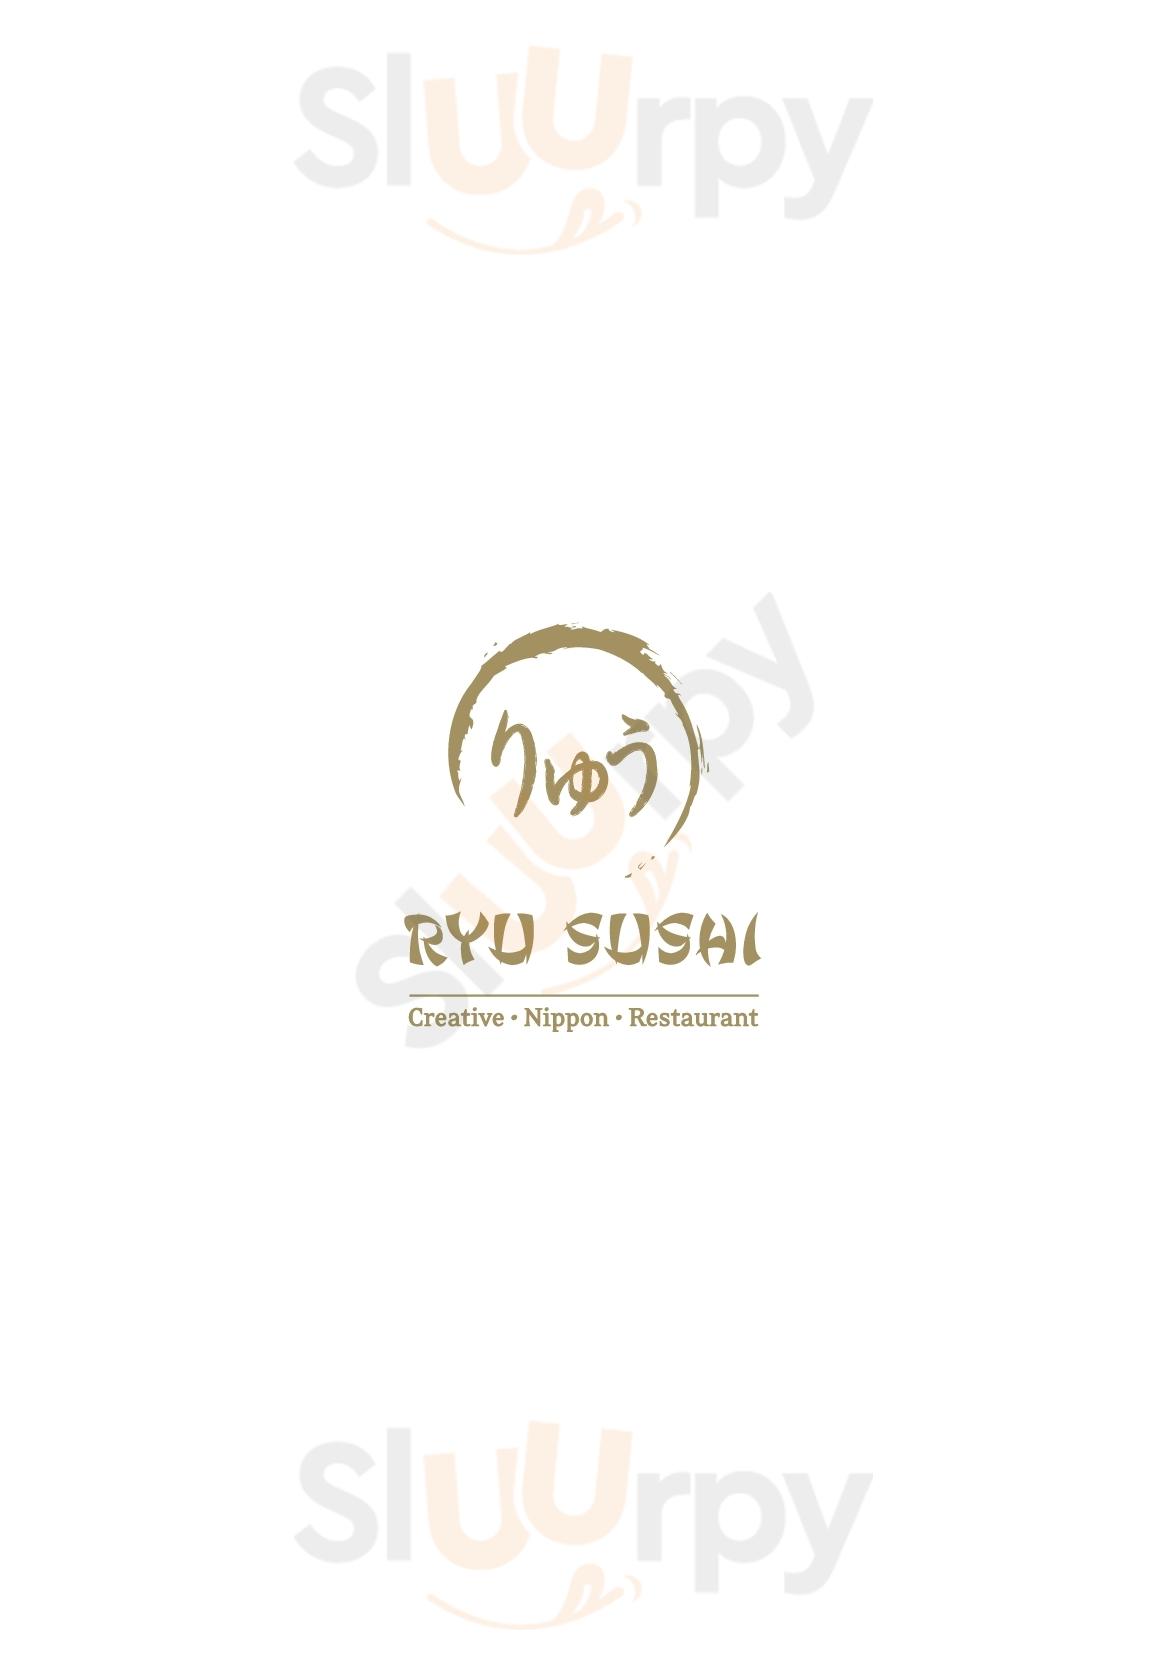 Ryu Sushi Milano menù 1 pagina